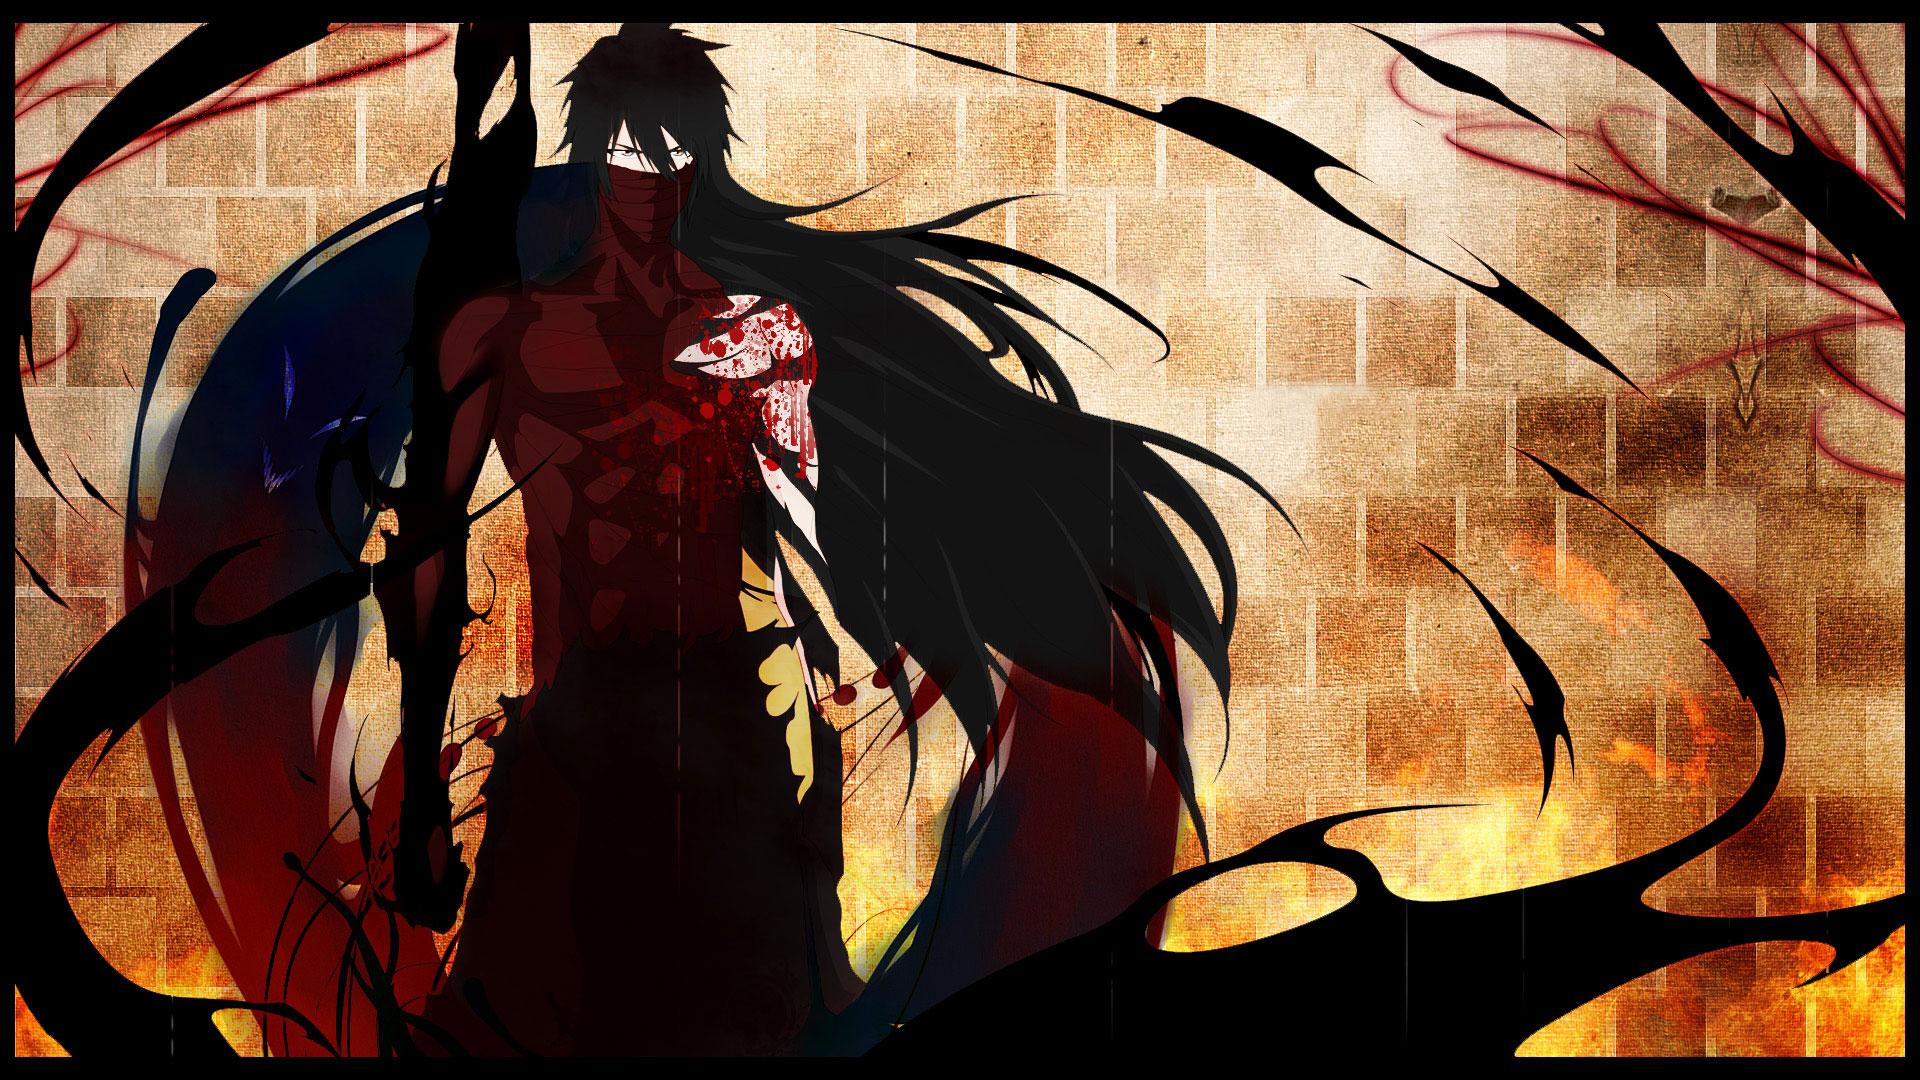 Saiyan Island – Naruto Storm 4, One Piece Burning Blood!